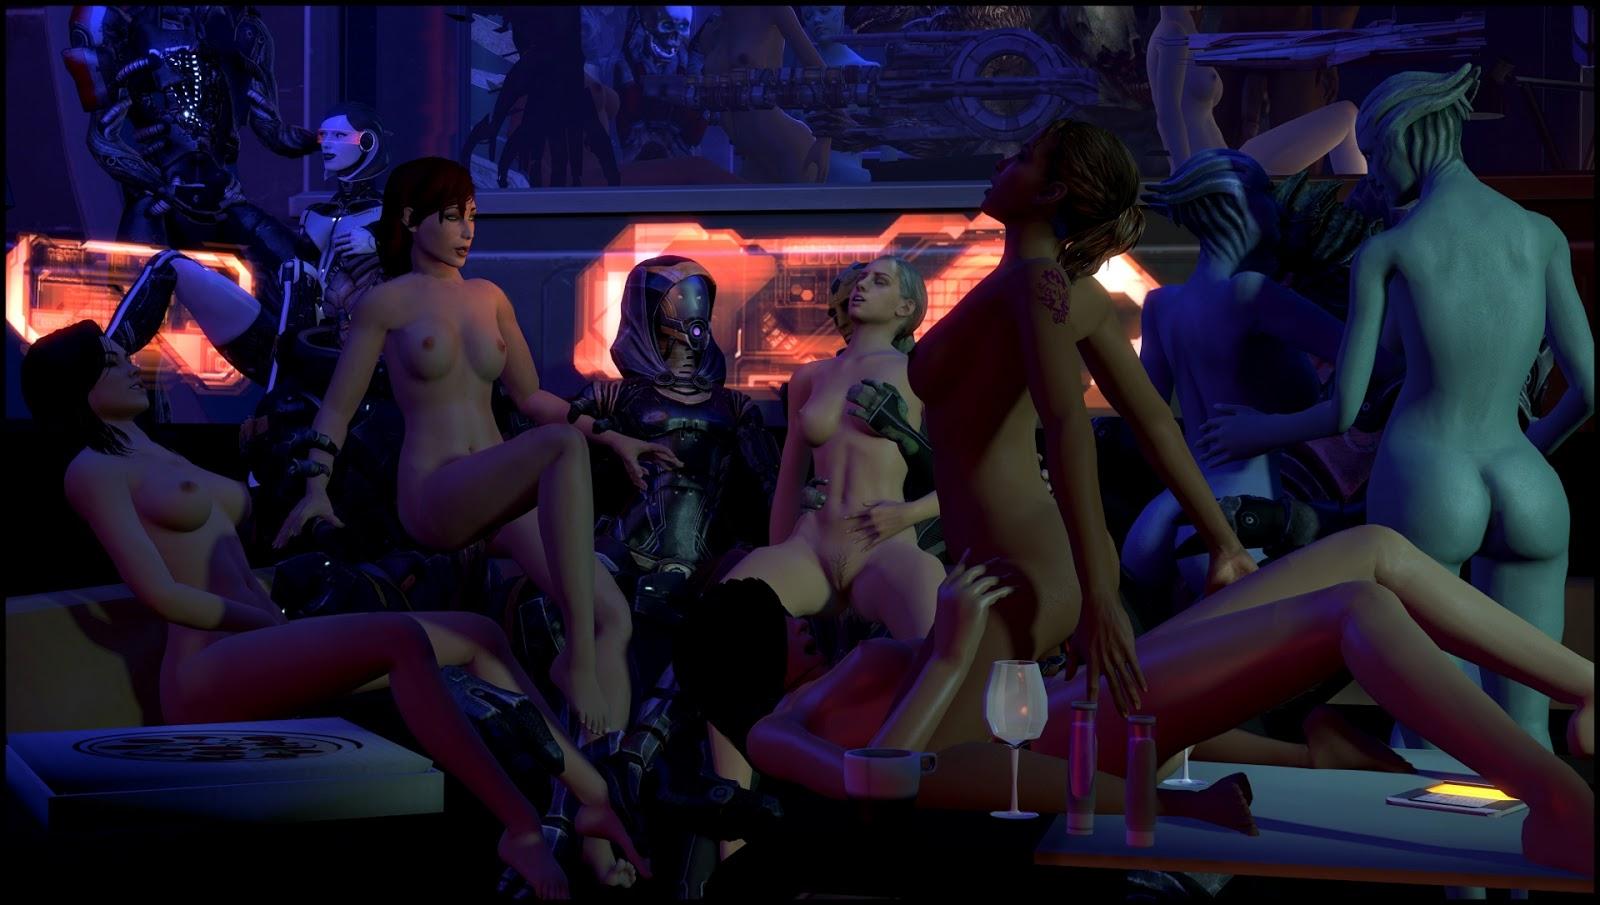 Nude mod edi softcore galleries